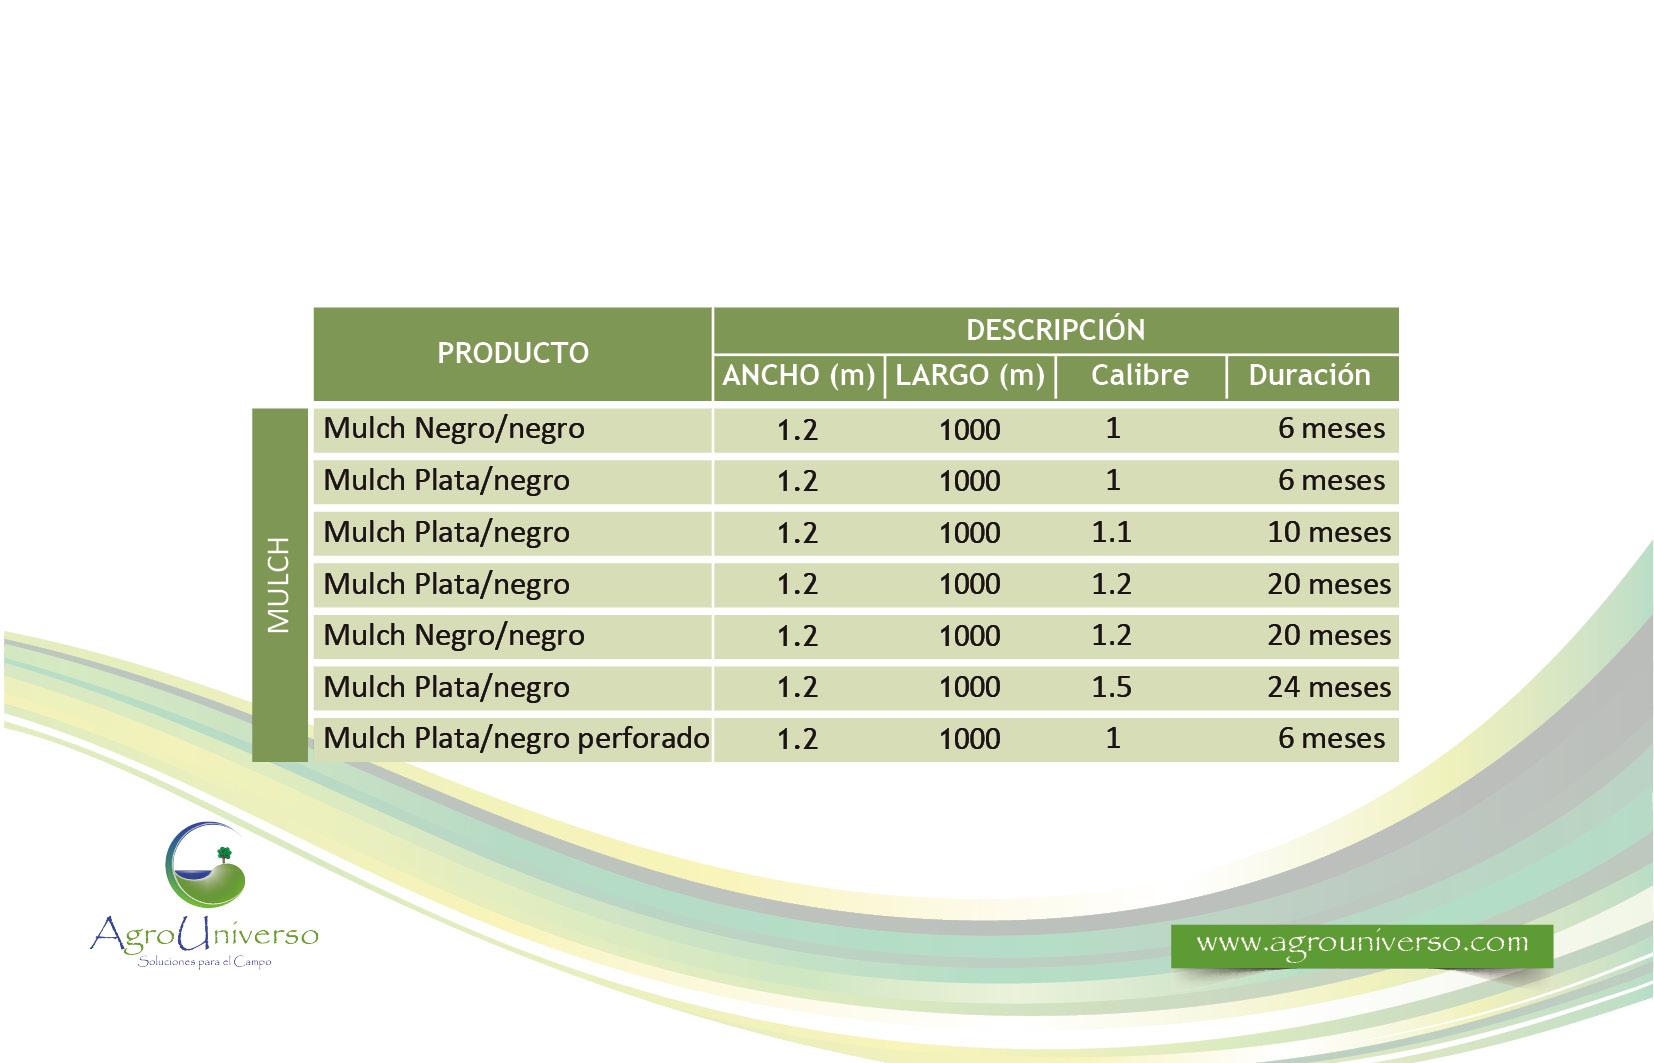 Catlogo-de-productos-Agrouniverso-9